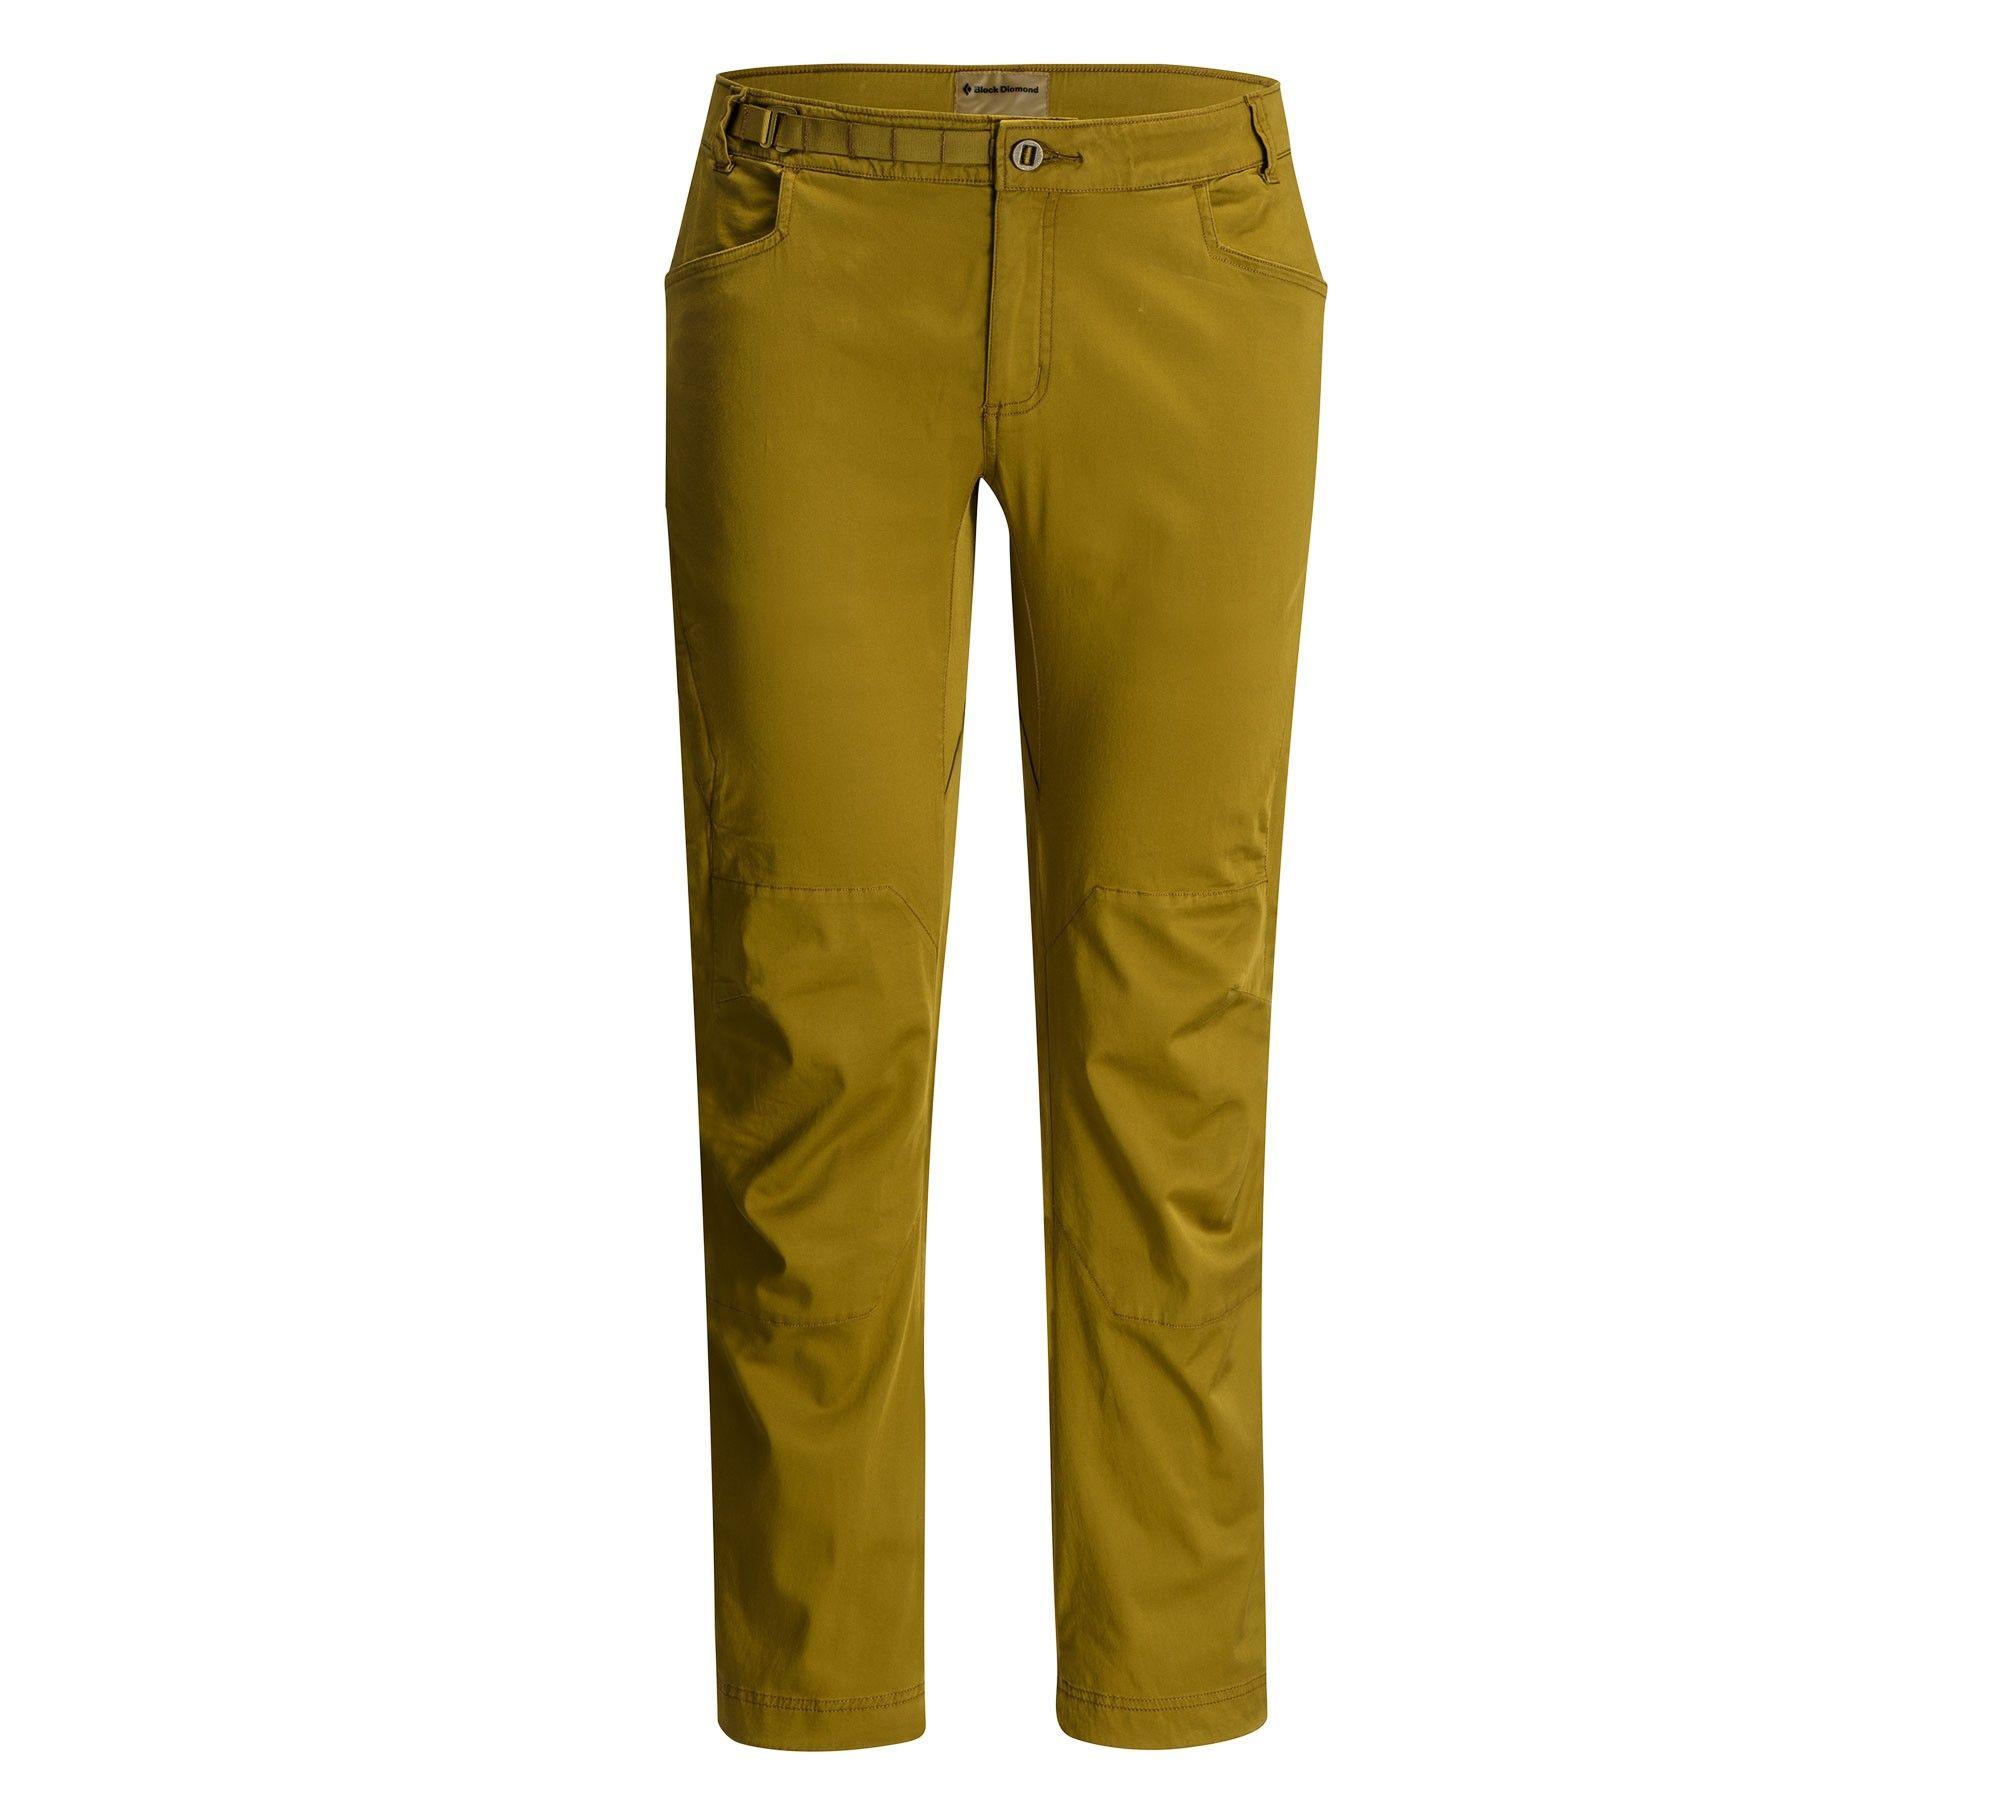 Black Diamond M Credo Pants | Größe 28,30,32,38,36 | Herren Hose